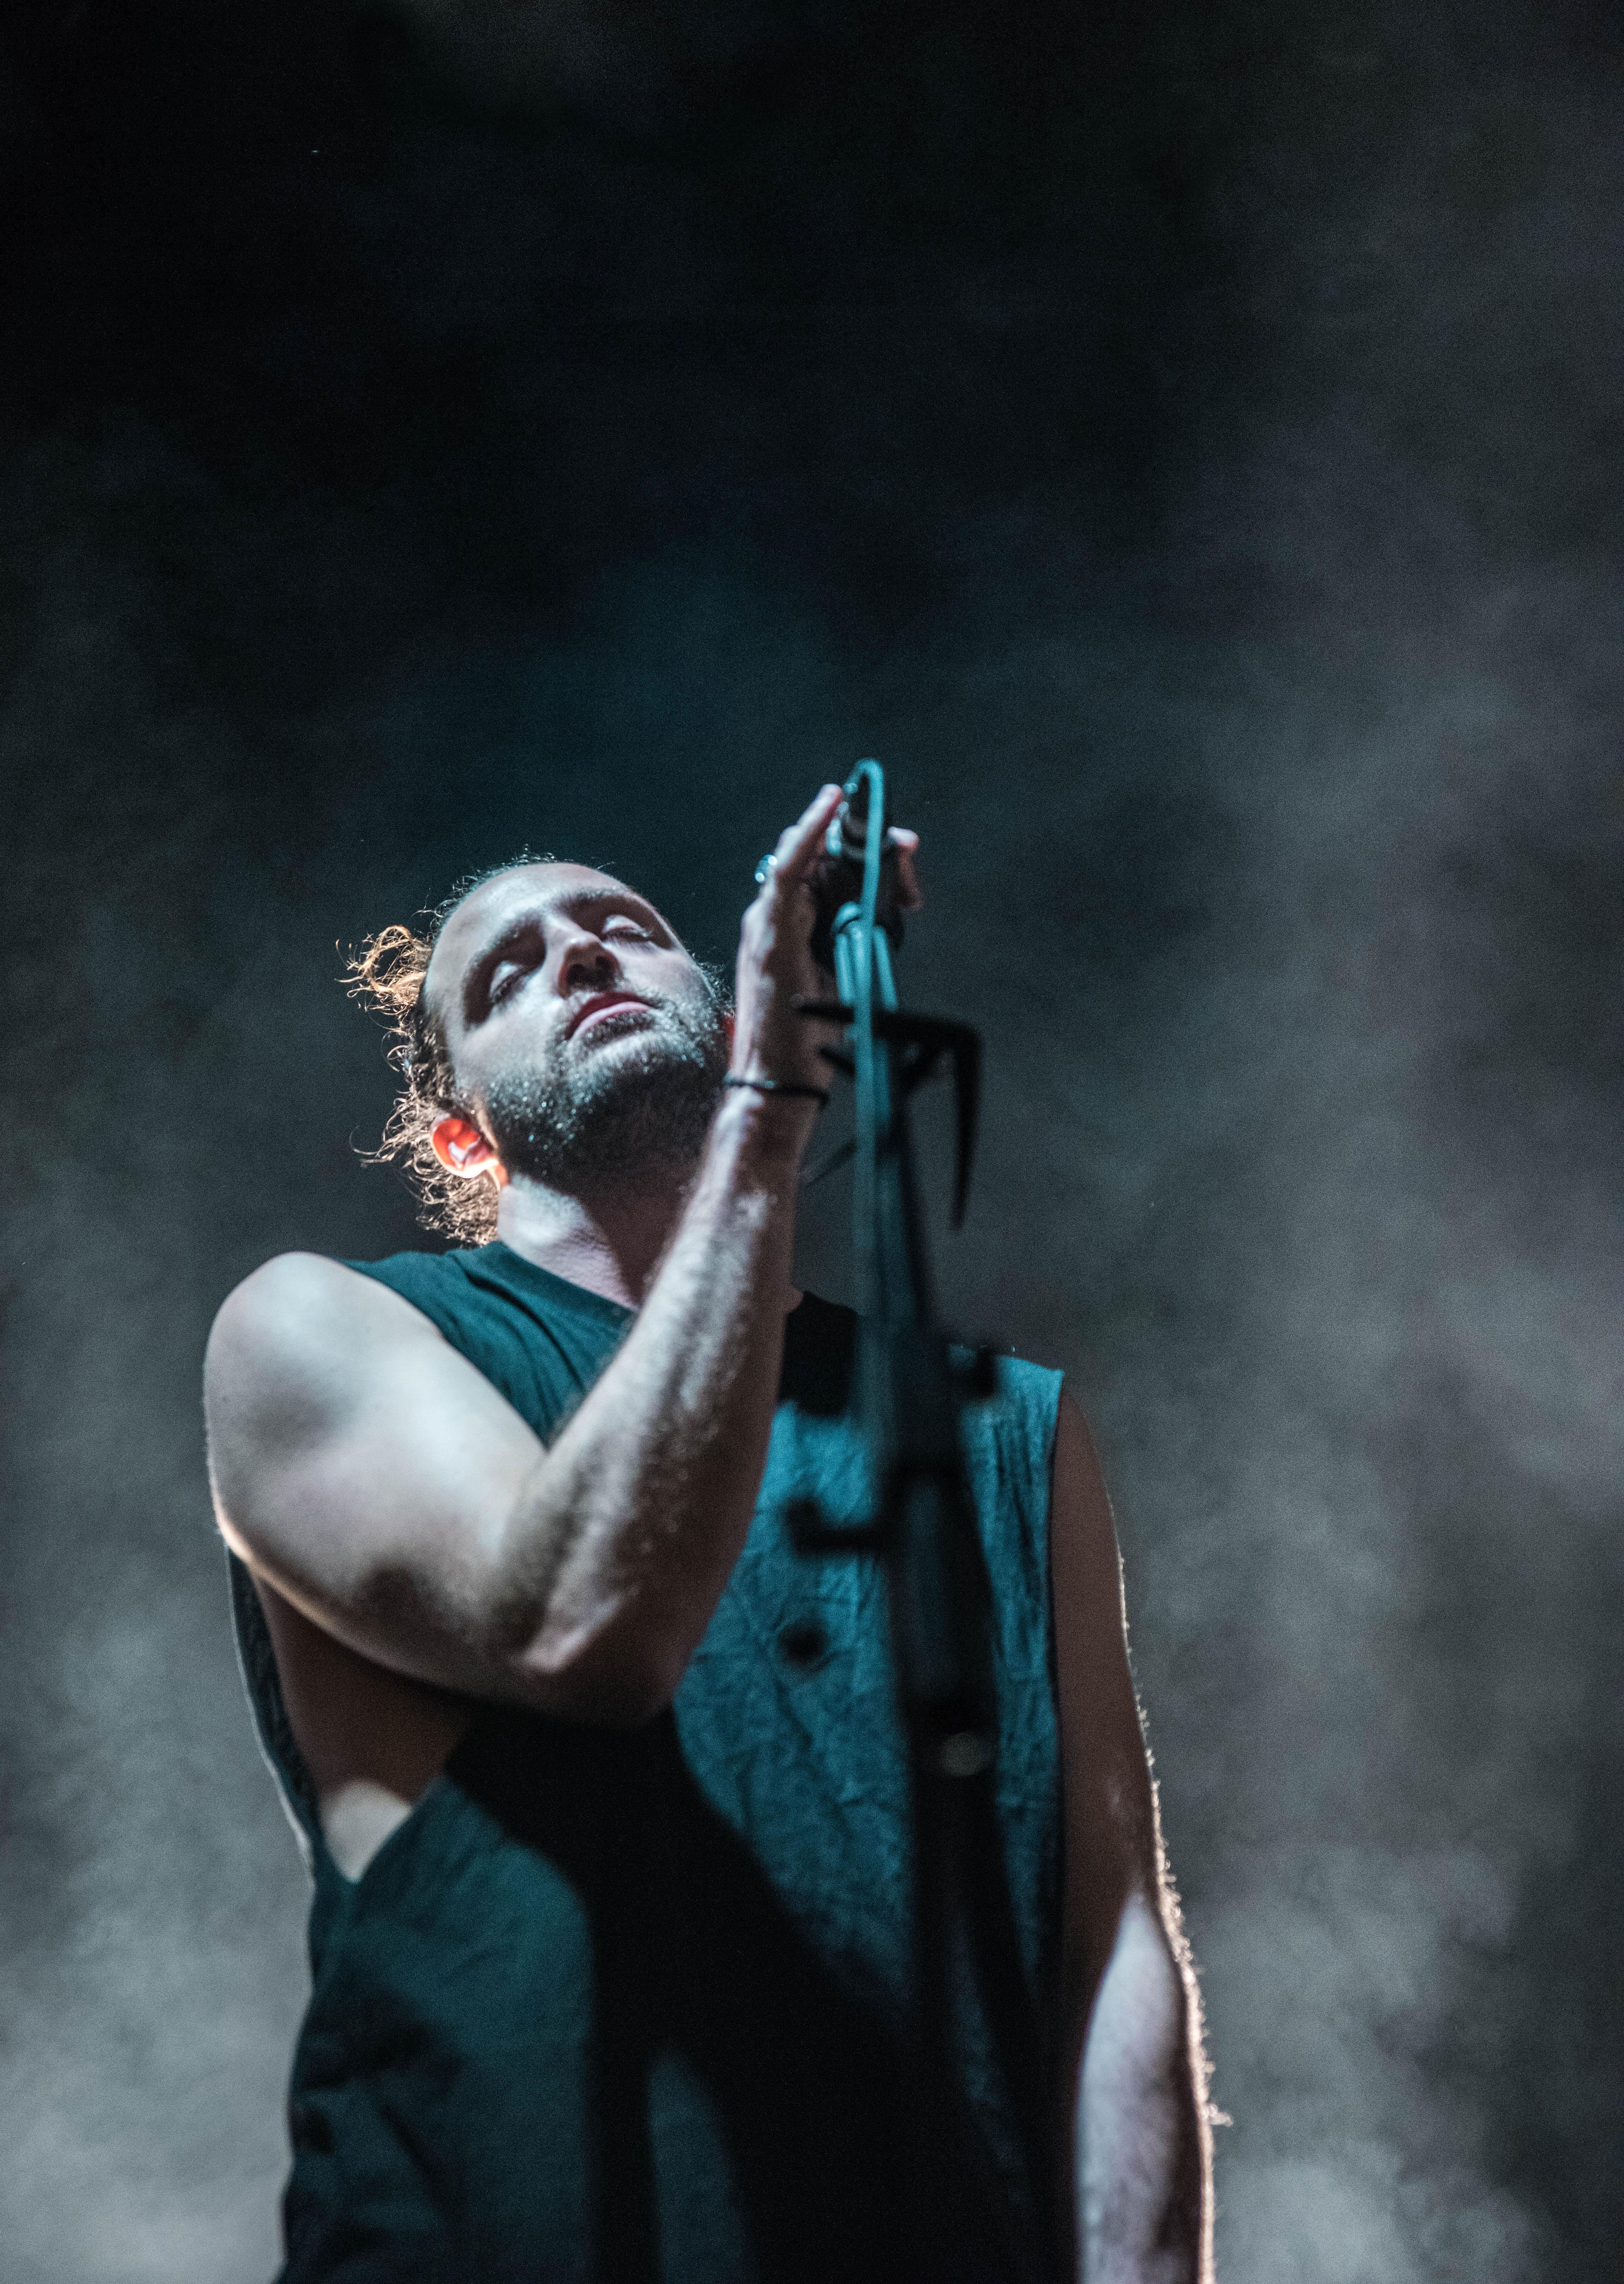 boo seeka music live review sydney photo credit dominique burns blackwell savage thrills savagethrills 3